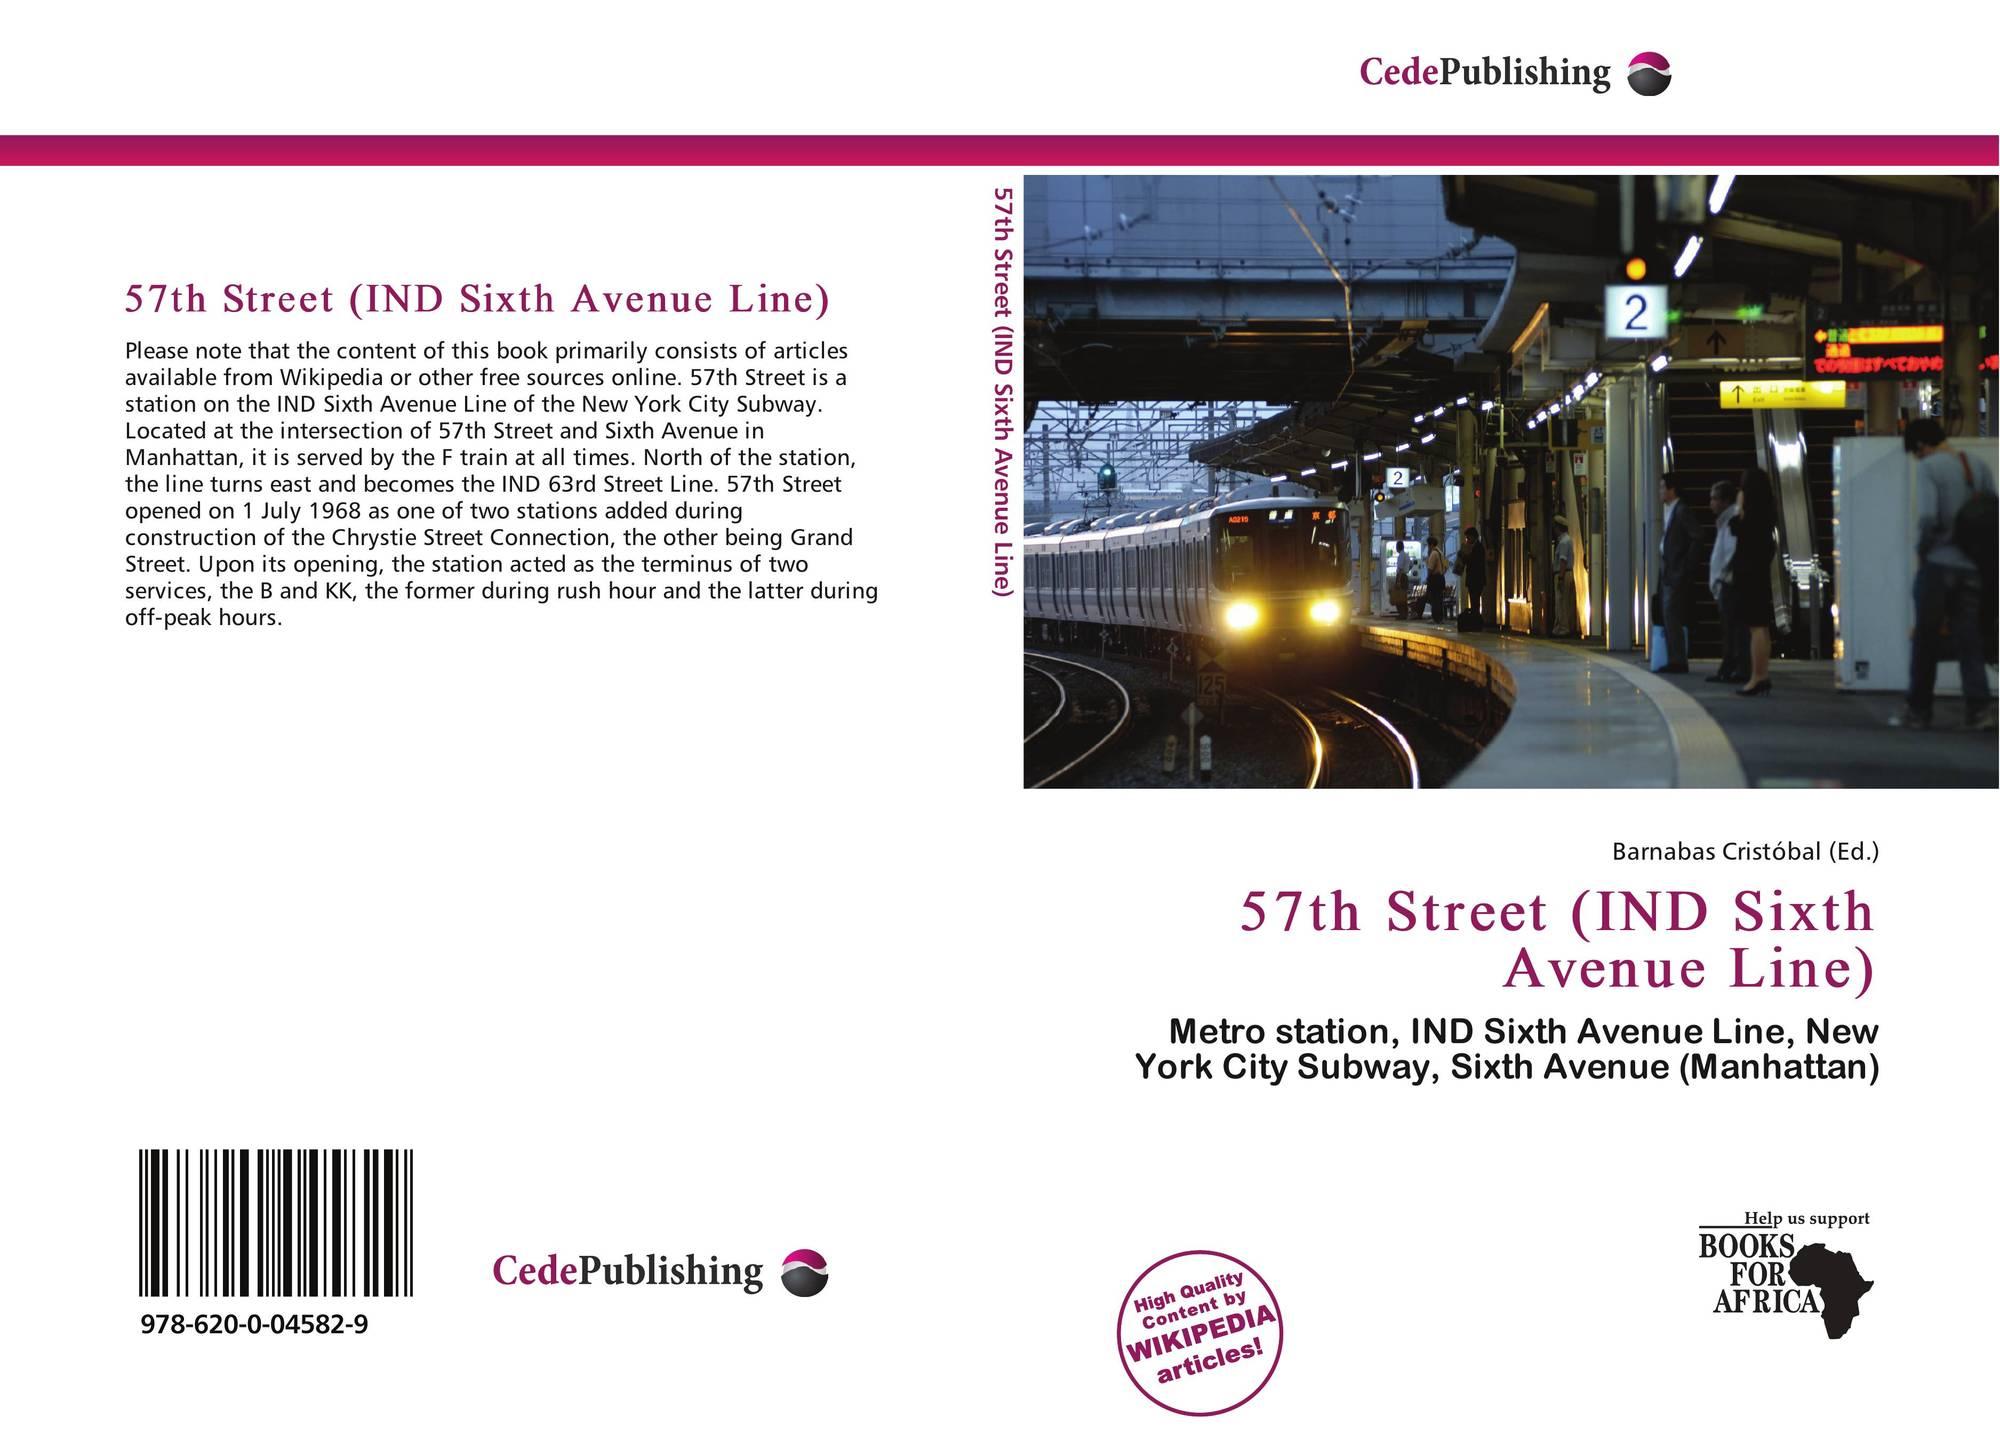 57th Street IND Sixth Avenue Line 978 620 0 04582 9 6200045828